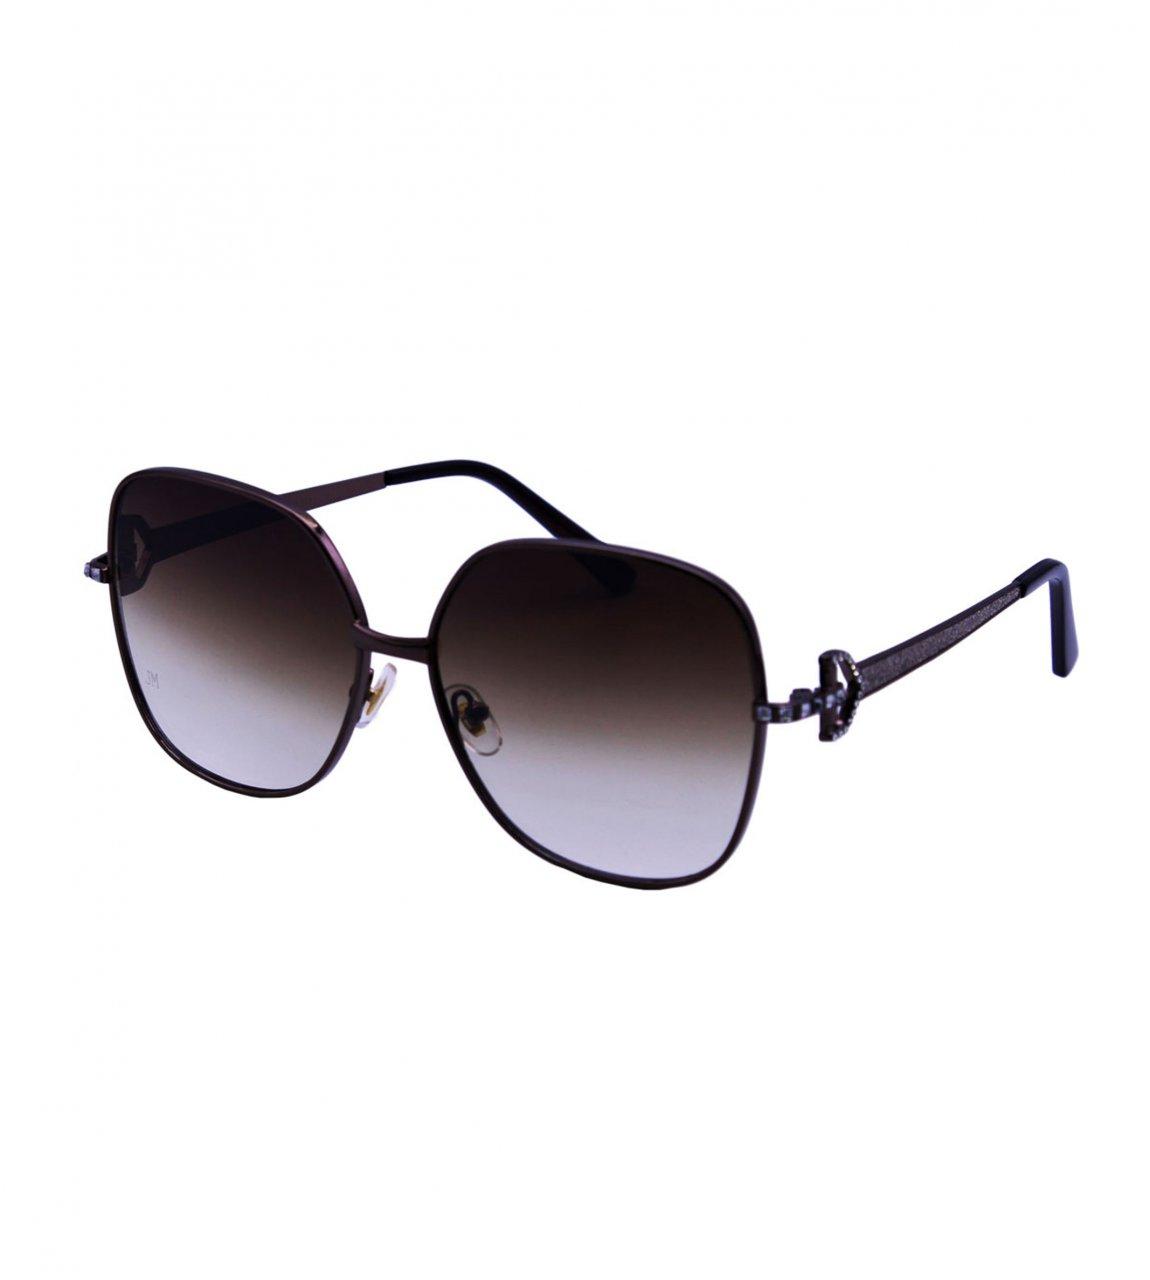 عینک های کپی JIMMY CHOO مدل 8032